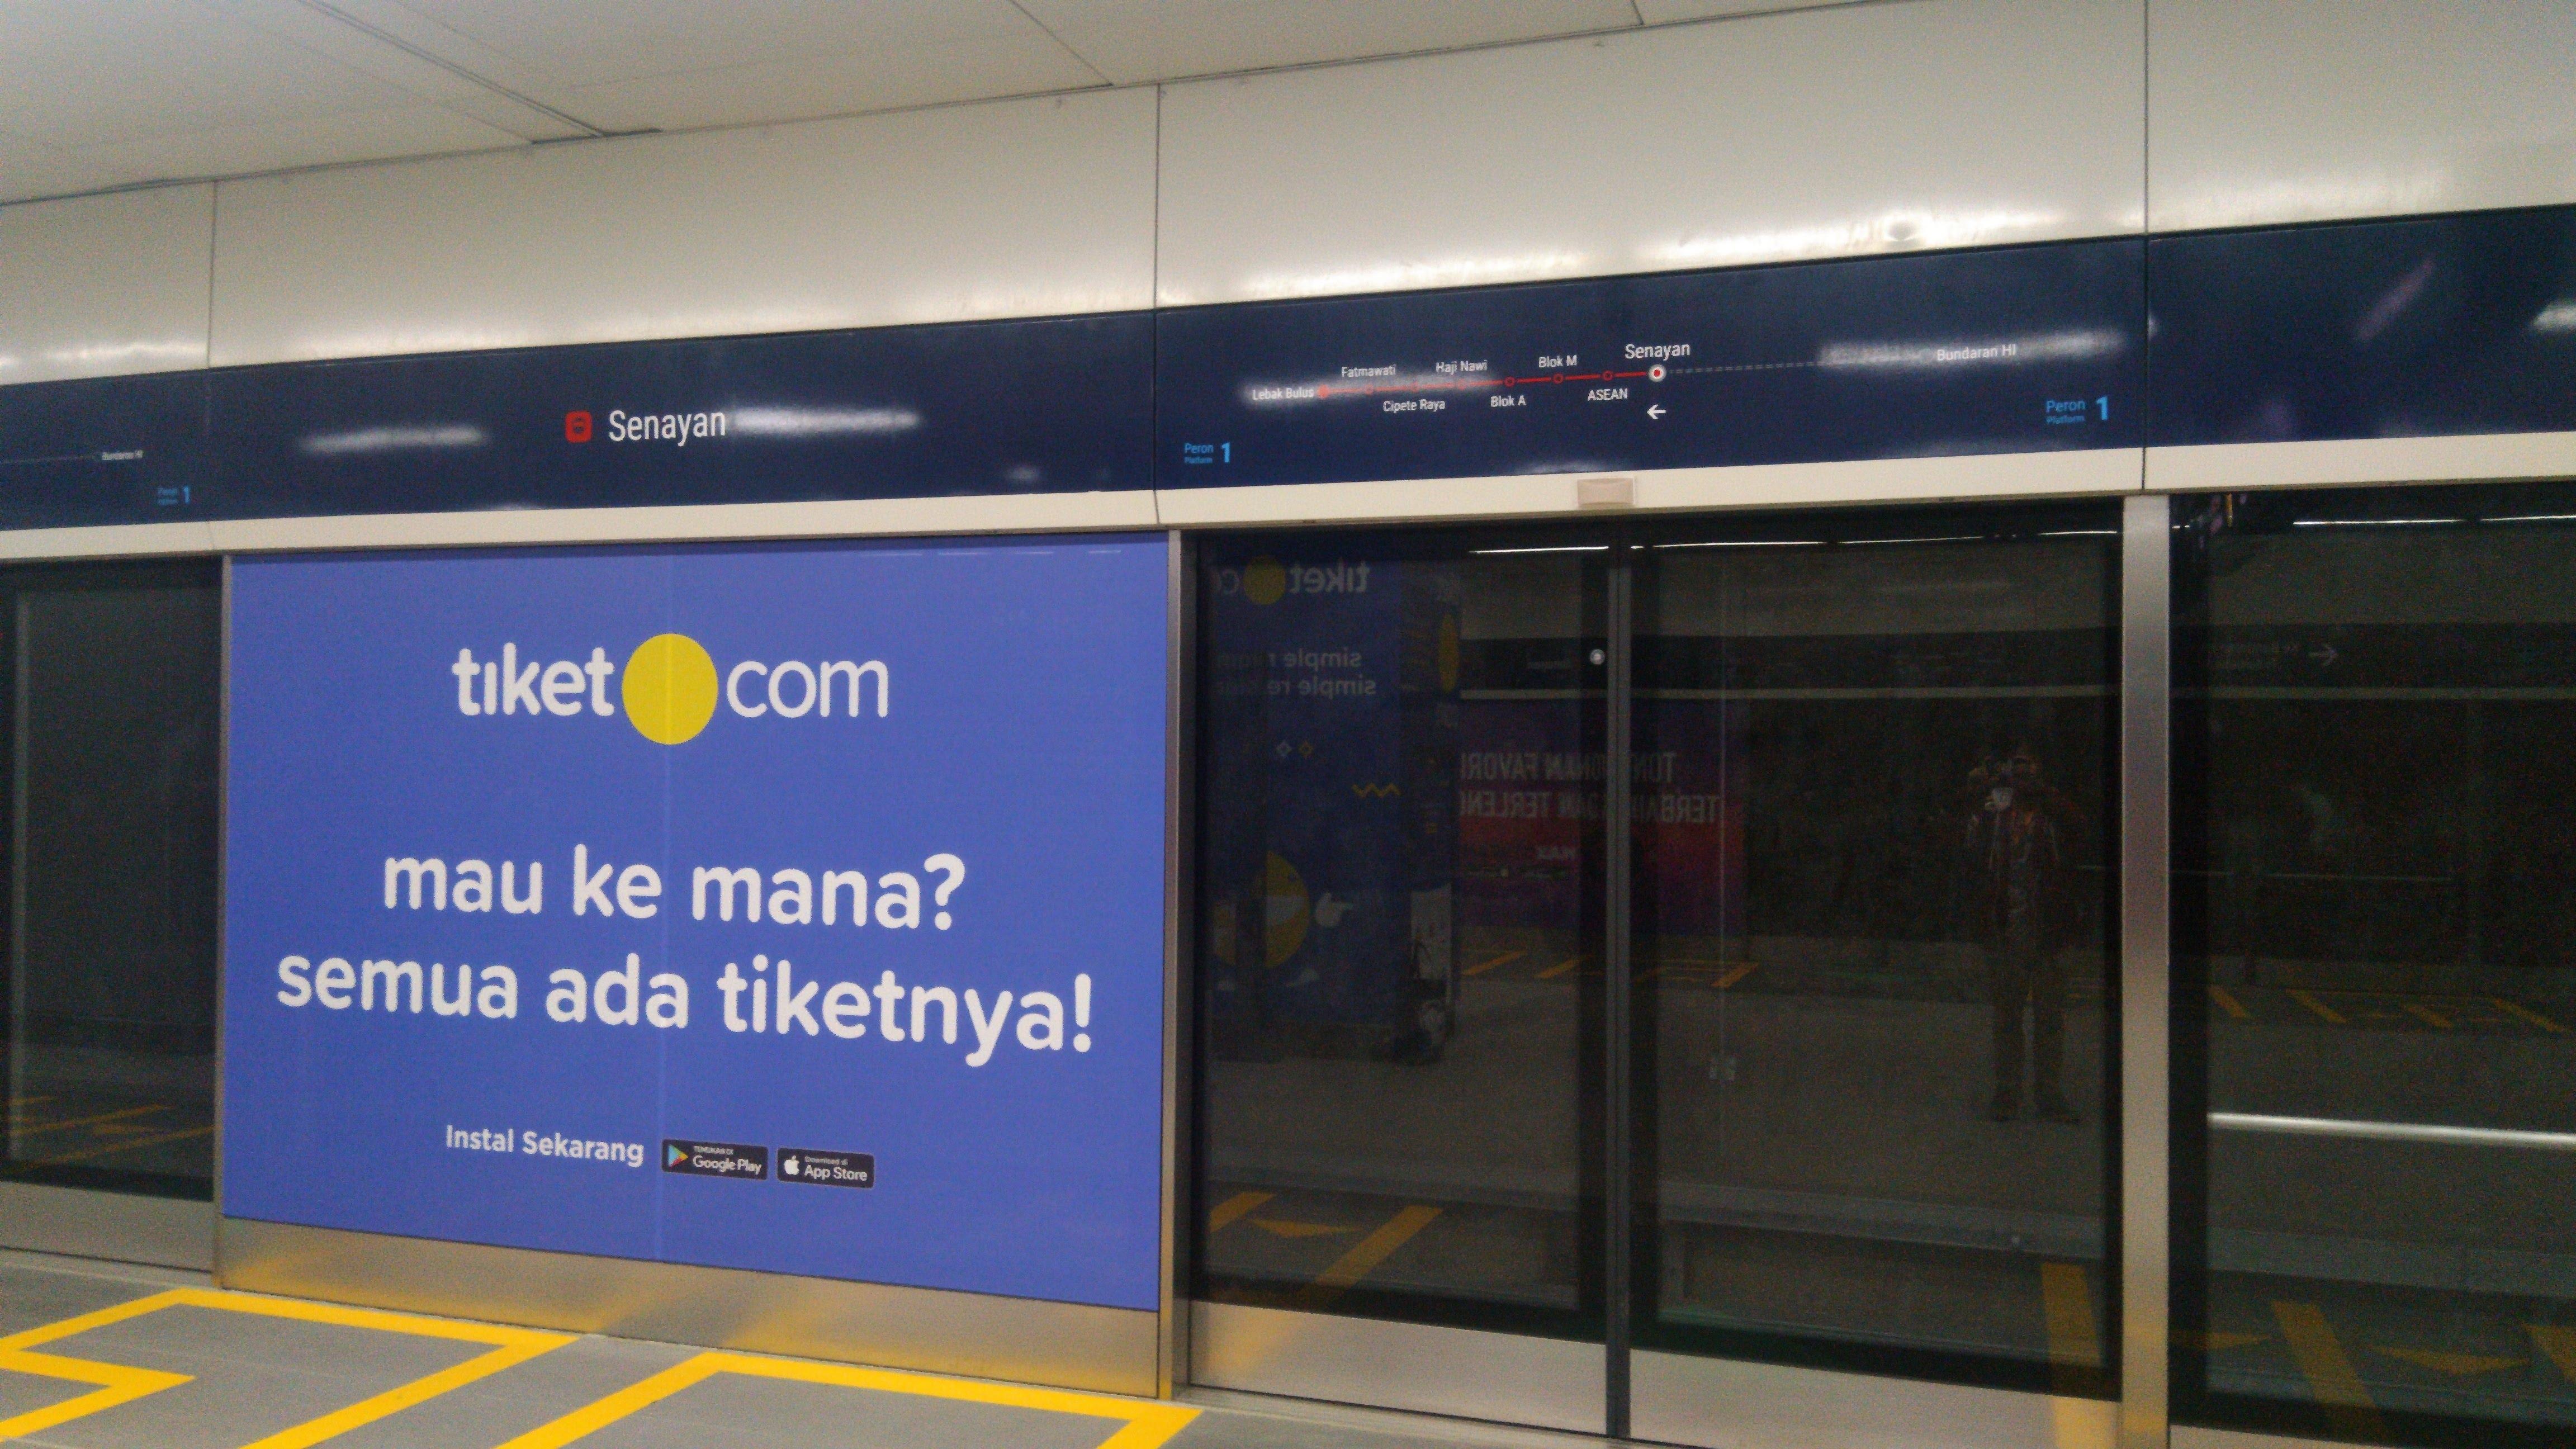 Stasiun Mrt Senayan Wikipedia Bahasa Indonesia Ensiklopedia Bebas